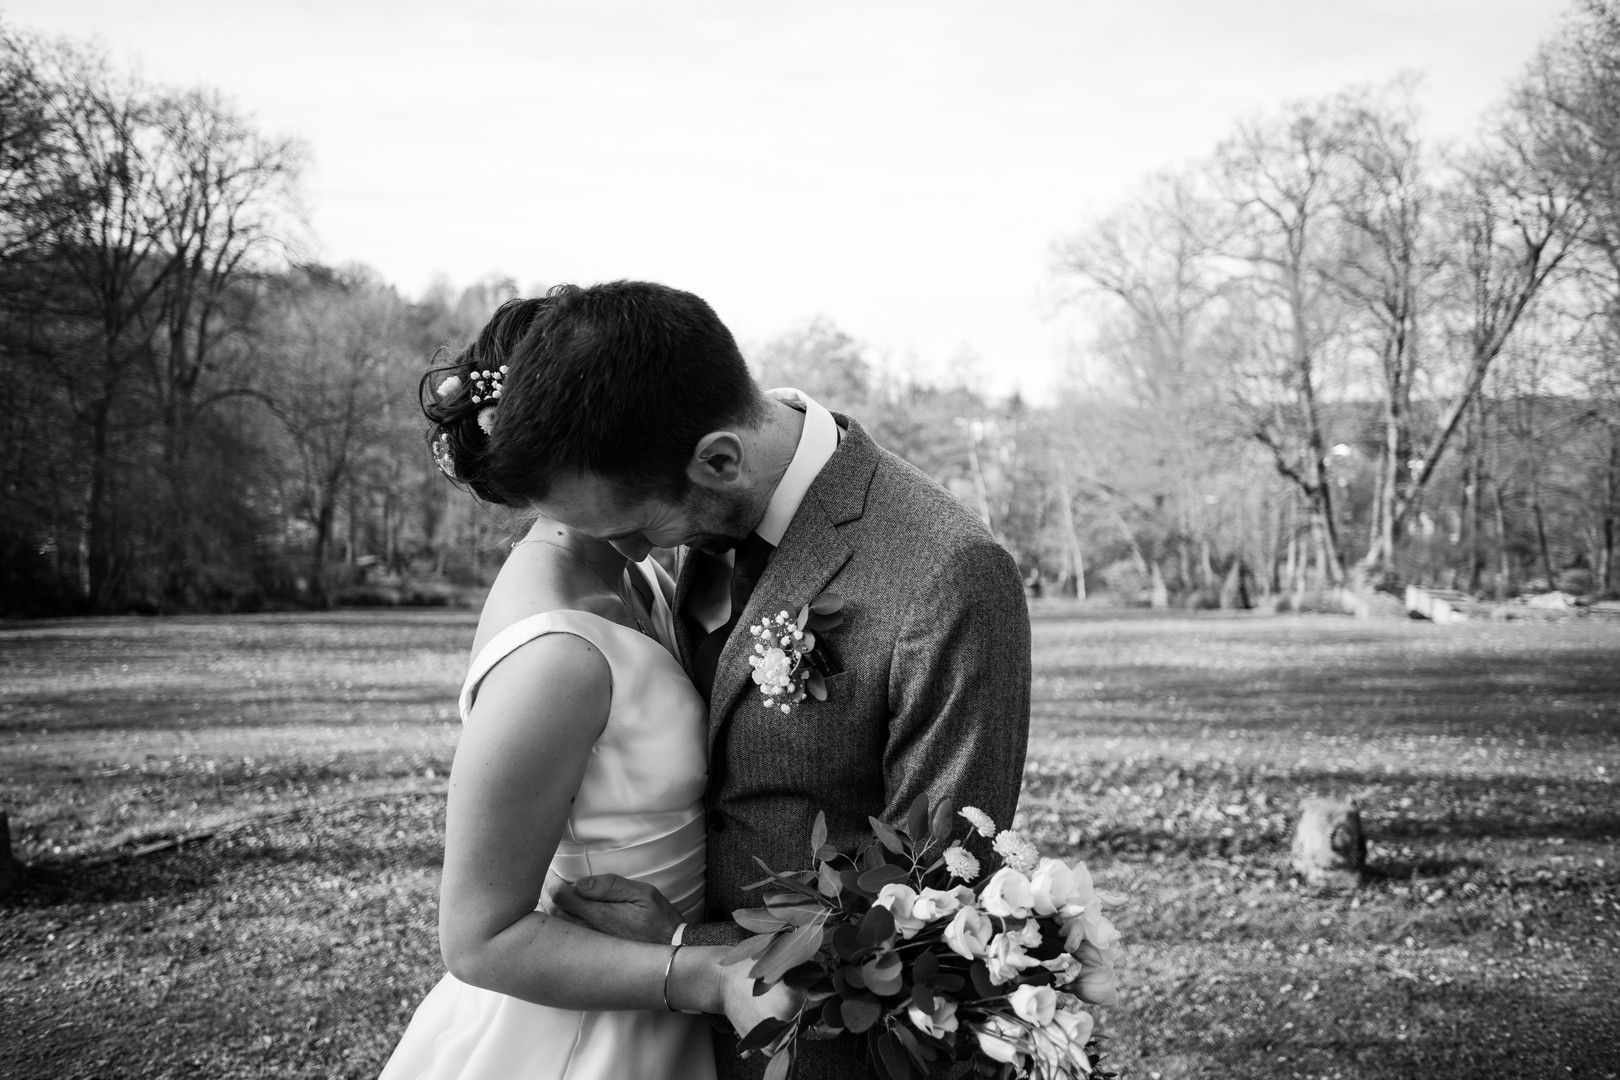 celine machy photographe - mariage - ess